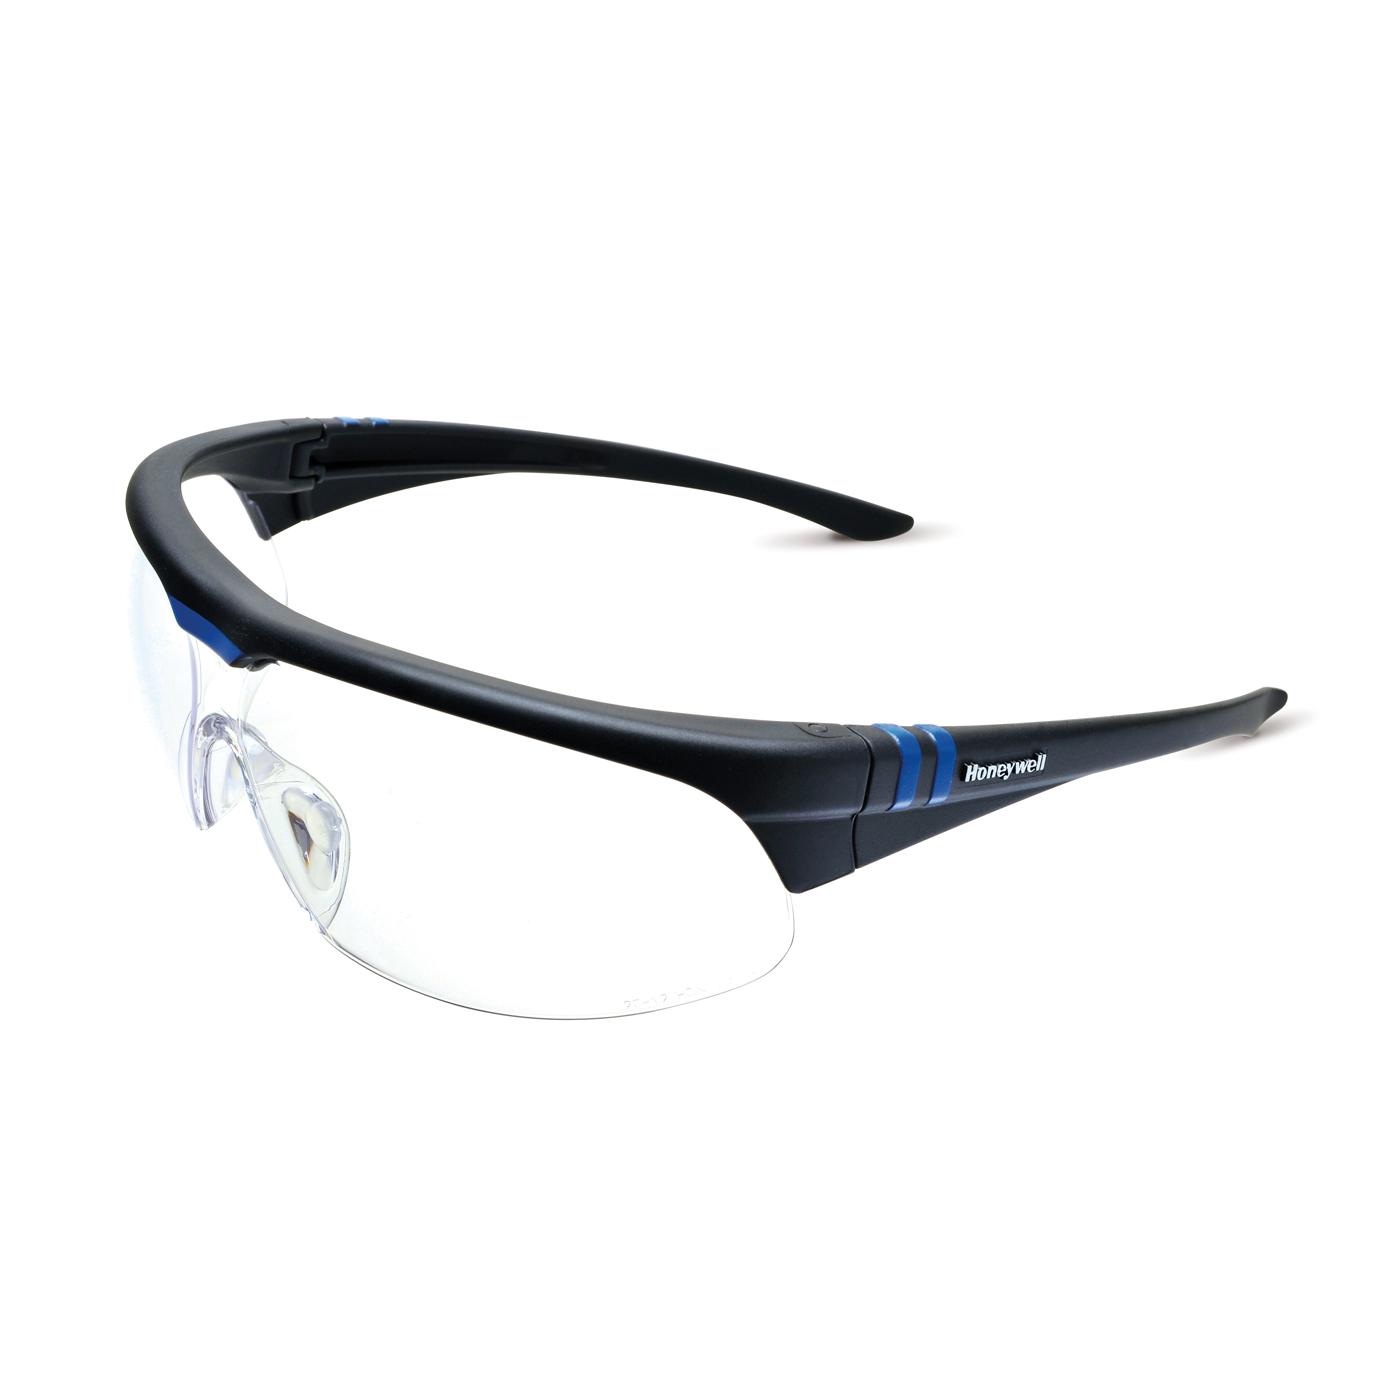 Okulary ochronne Millennia 2G 1032179 Honeywell bezbarwna soczewka